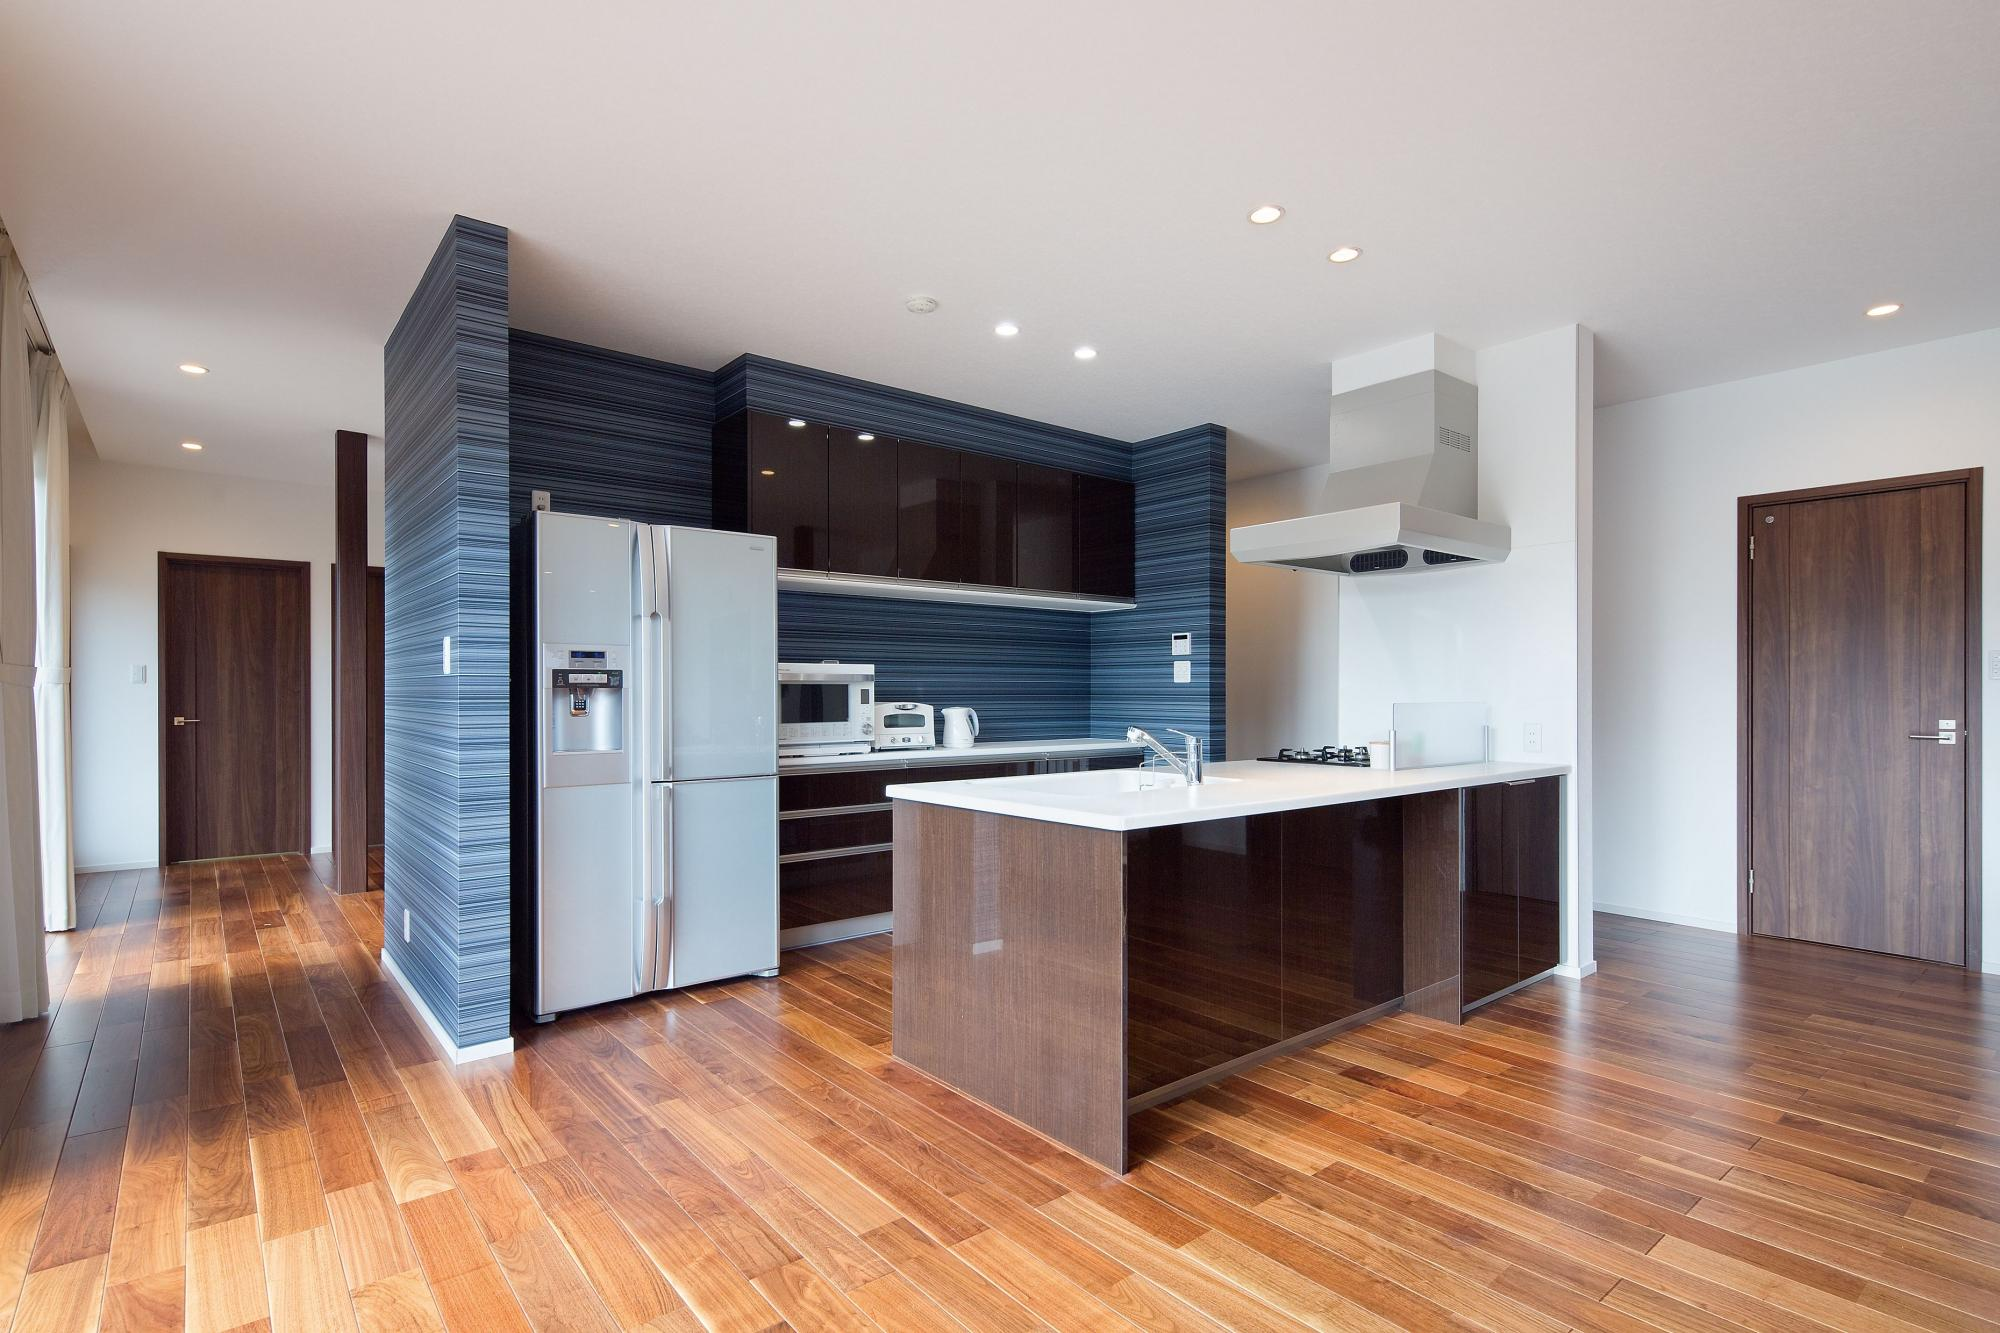 LDとひと続きになったキッチンは、奥様の希望でお子様を見守りながら家事や料理ができる対面式のペニンシュラタイプに。背面にはモノが置けるカウンタータイプの収納棚を設置し、キッチンの近くにはパントリーも設けた。